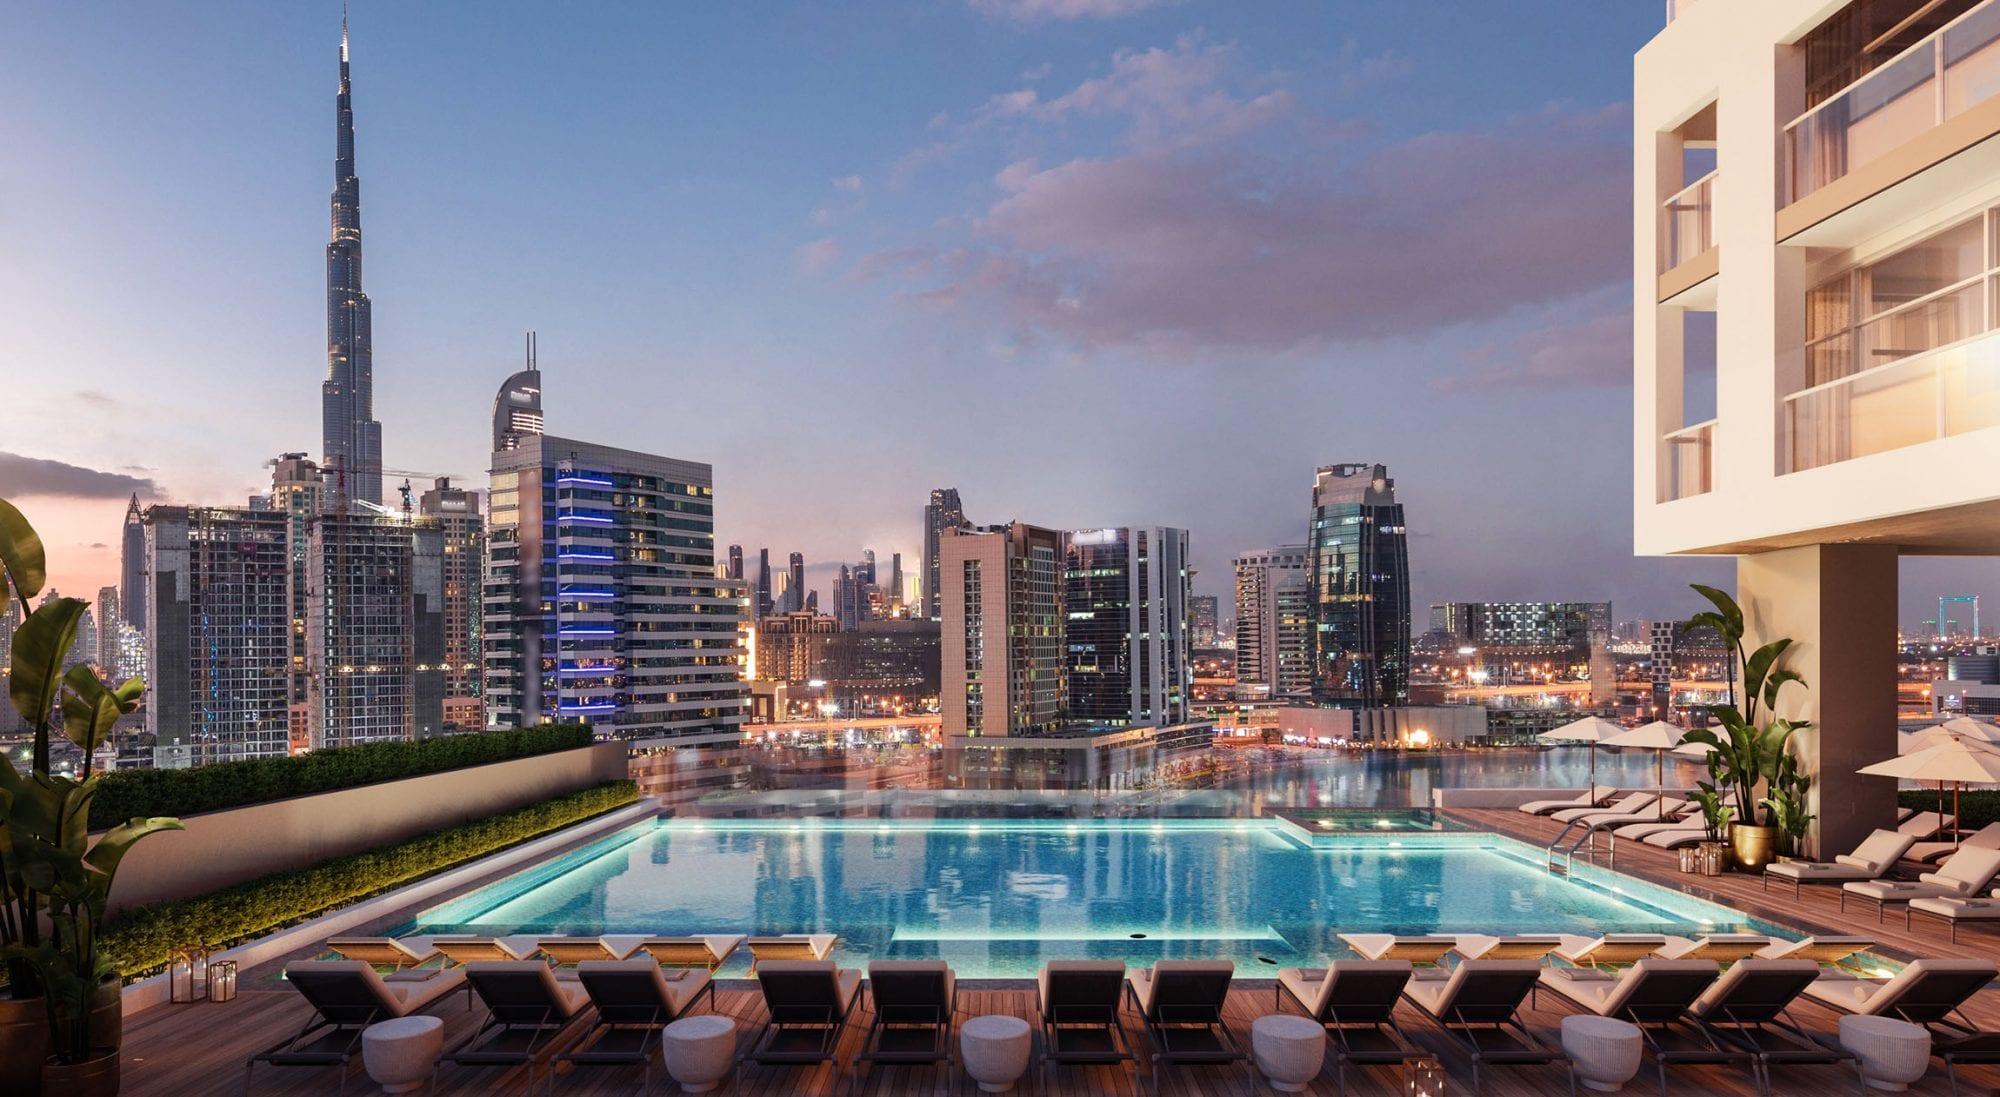 Waterfront Infinity Pool with Burj Khalifa Views